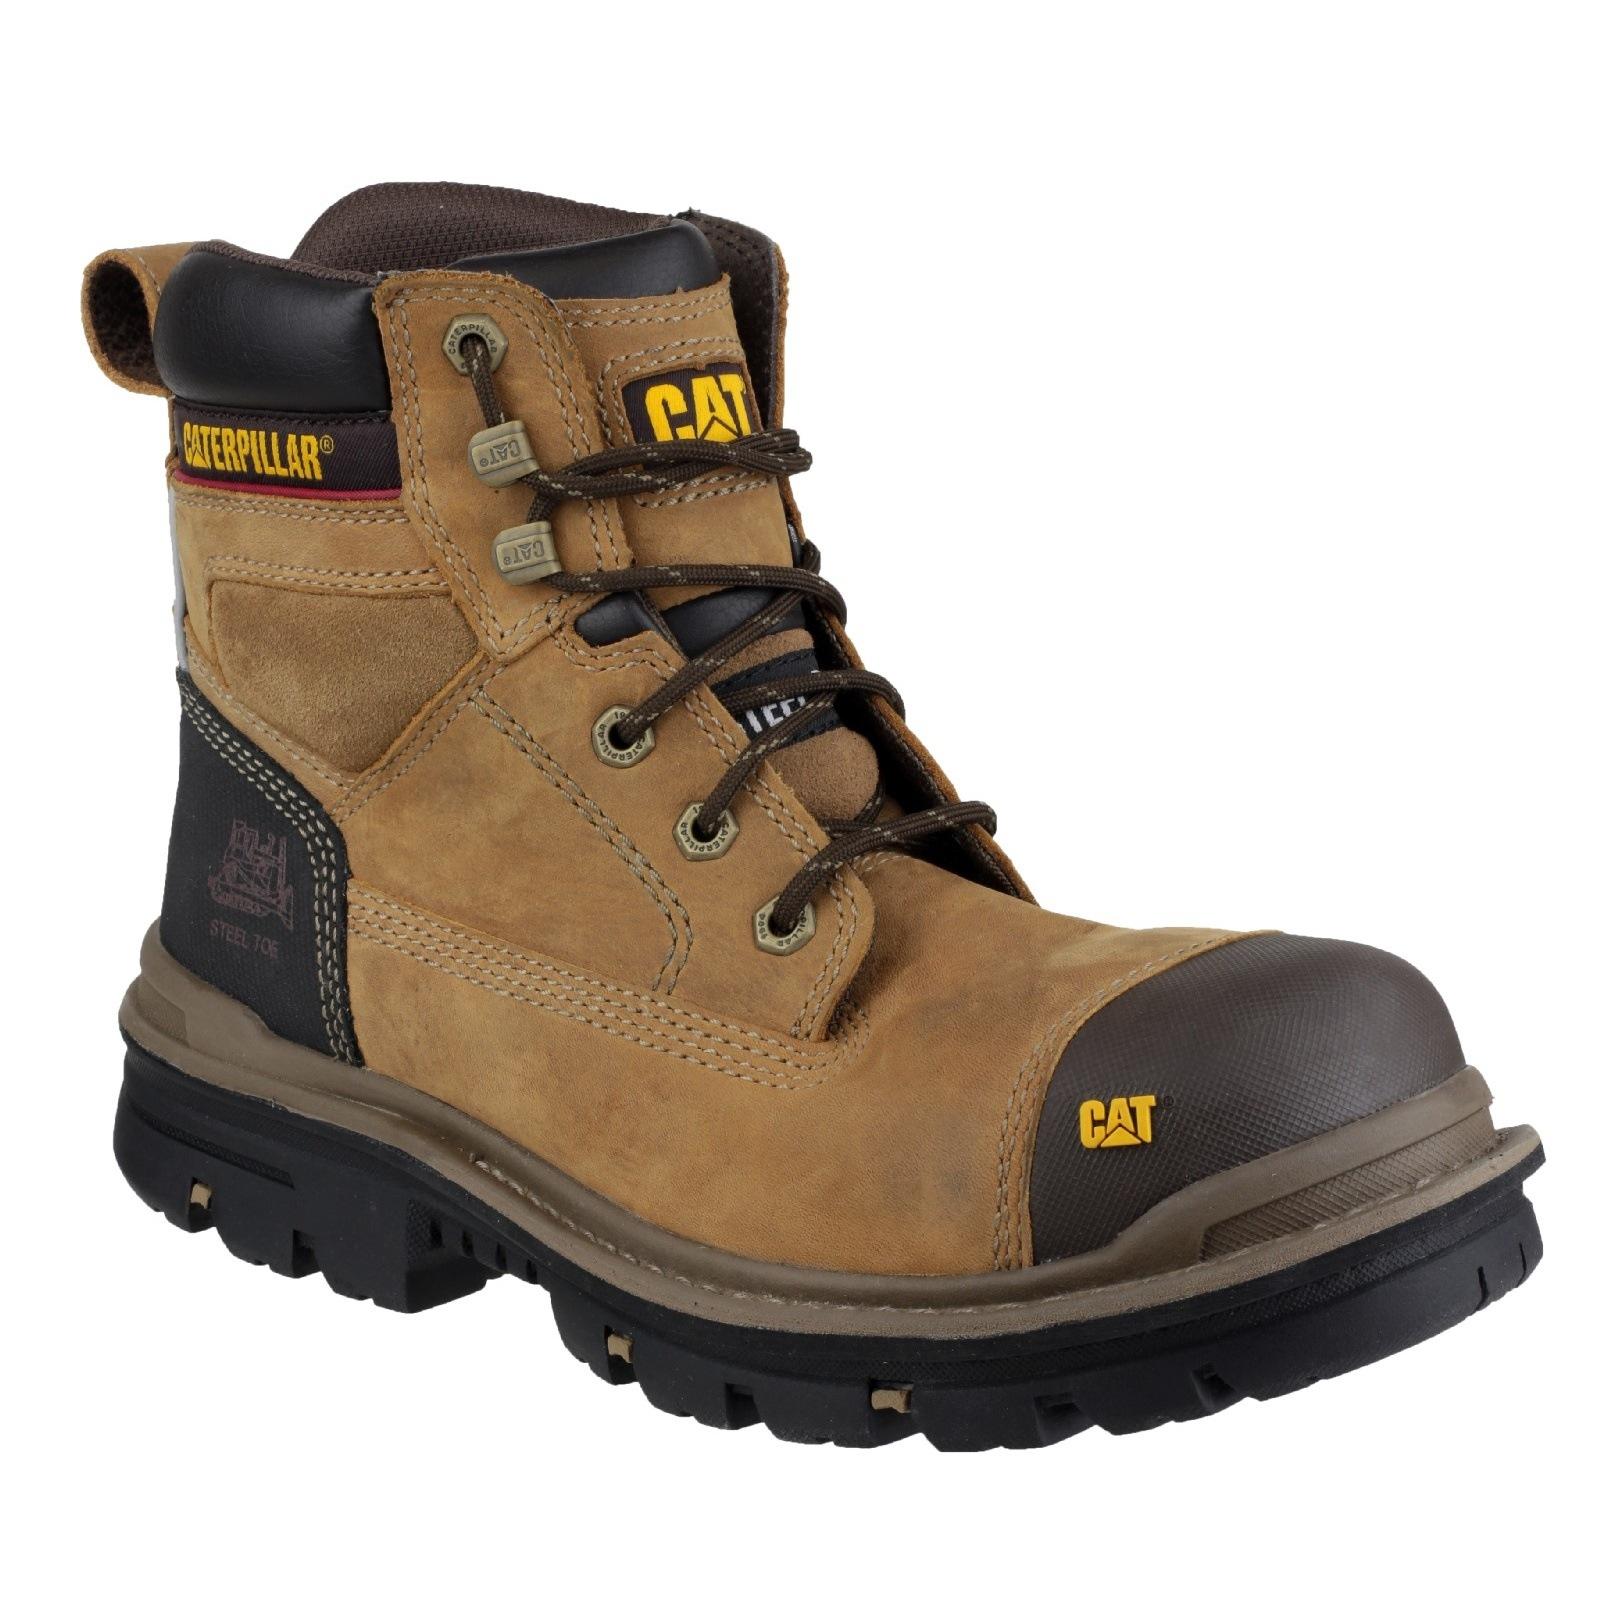 CATERPILLAR Arbeitsschuh Gravel Herren Sicherheitsschuhe / Sicherheitsstiefel Herrenmode/Schuhe/Komfortschuhe/Schnürschuhe